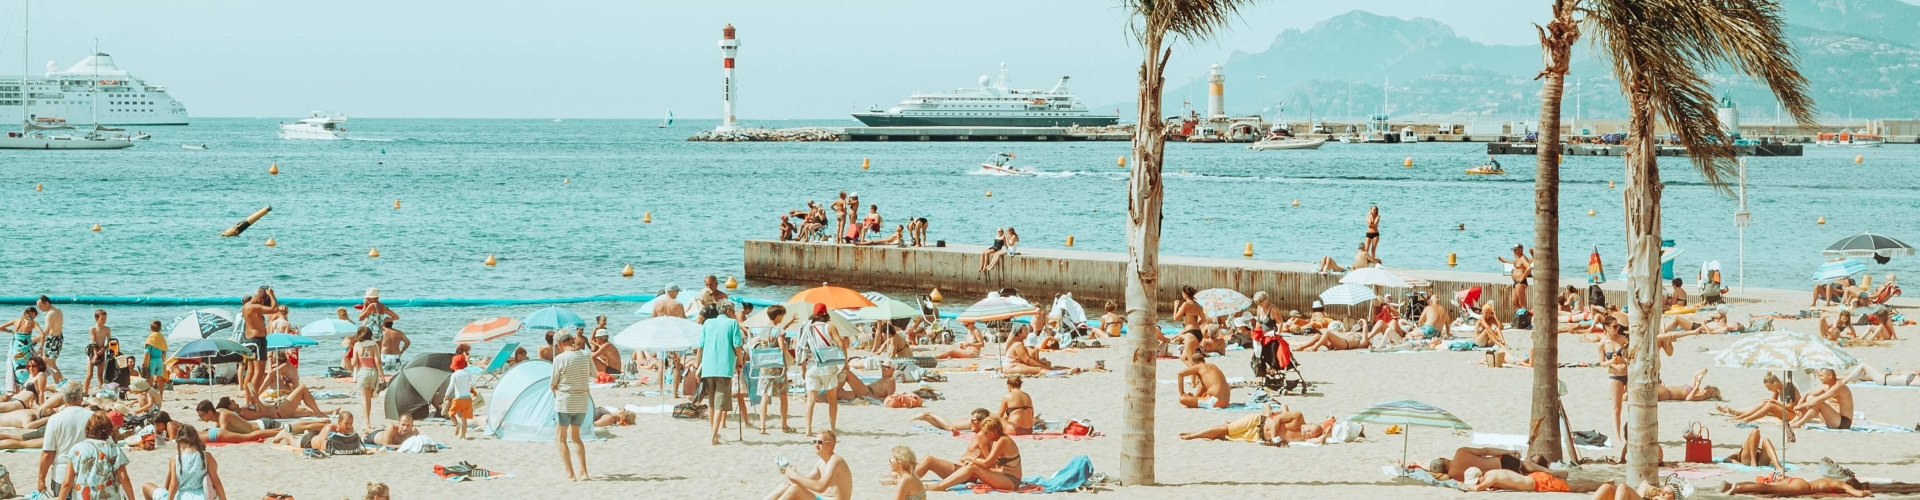 Yelr: het leukste reisplatform van Nederland